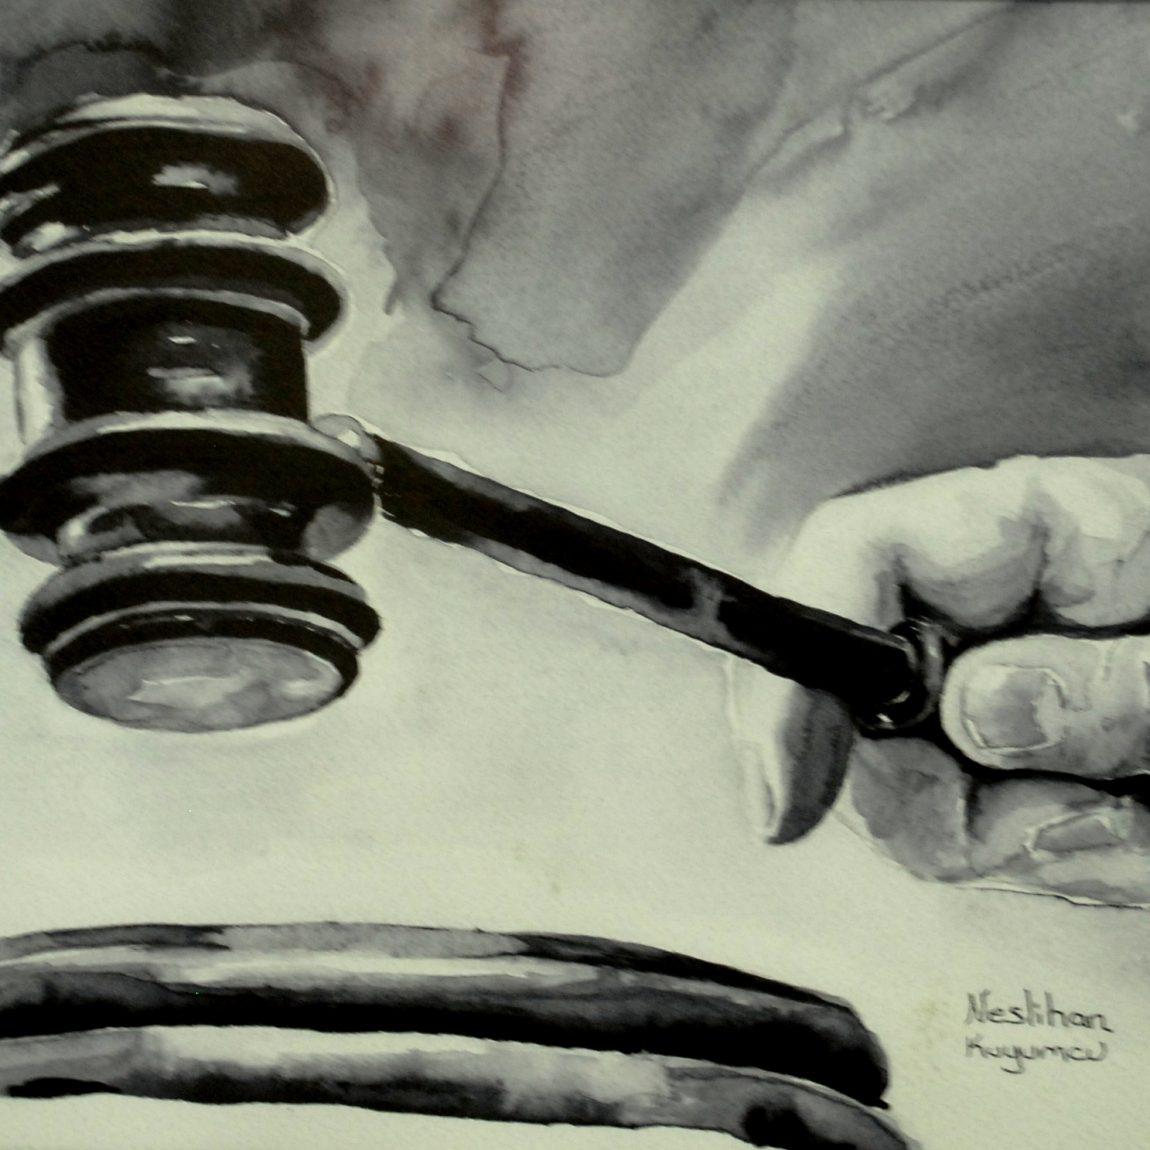 Sanatçı : Neslihan Kuyumcu  - Teknik: Lavi - Ölçü: 25 x 30 cm - Fiyat : 1.180 TL